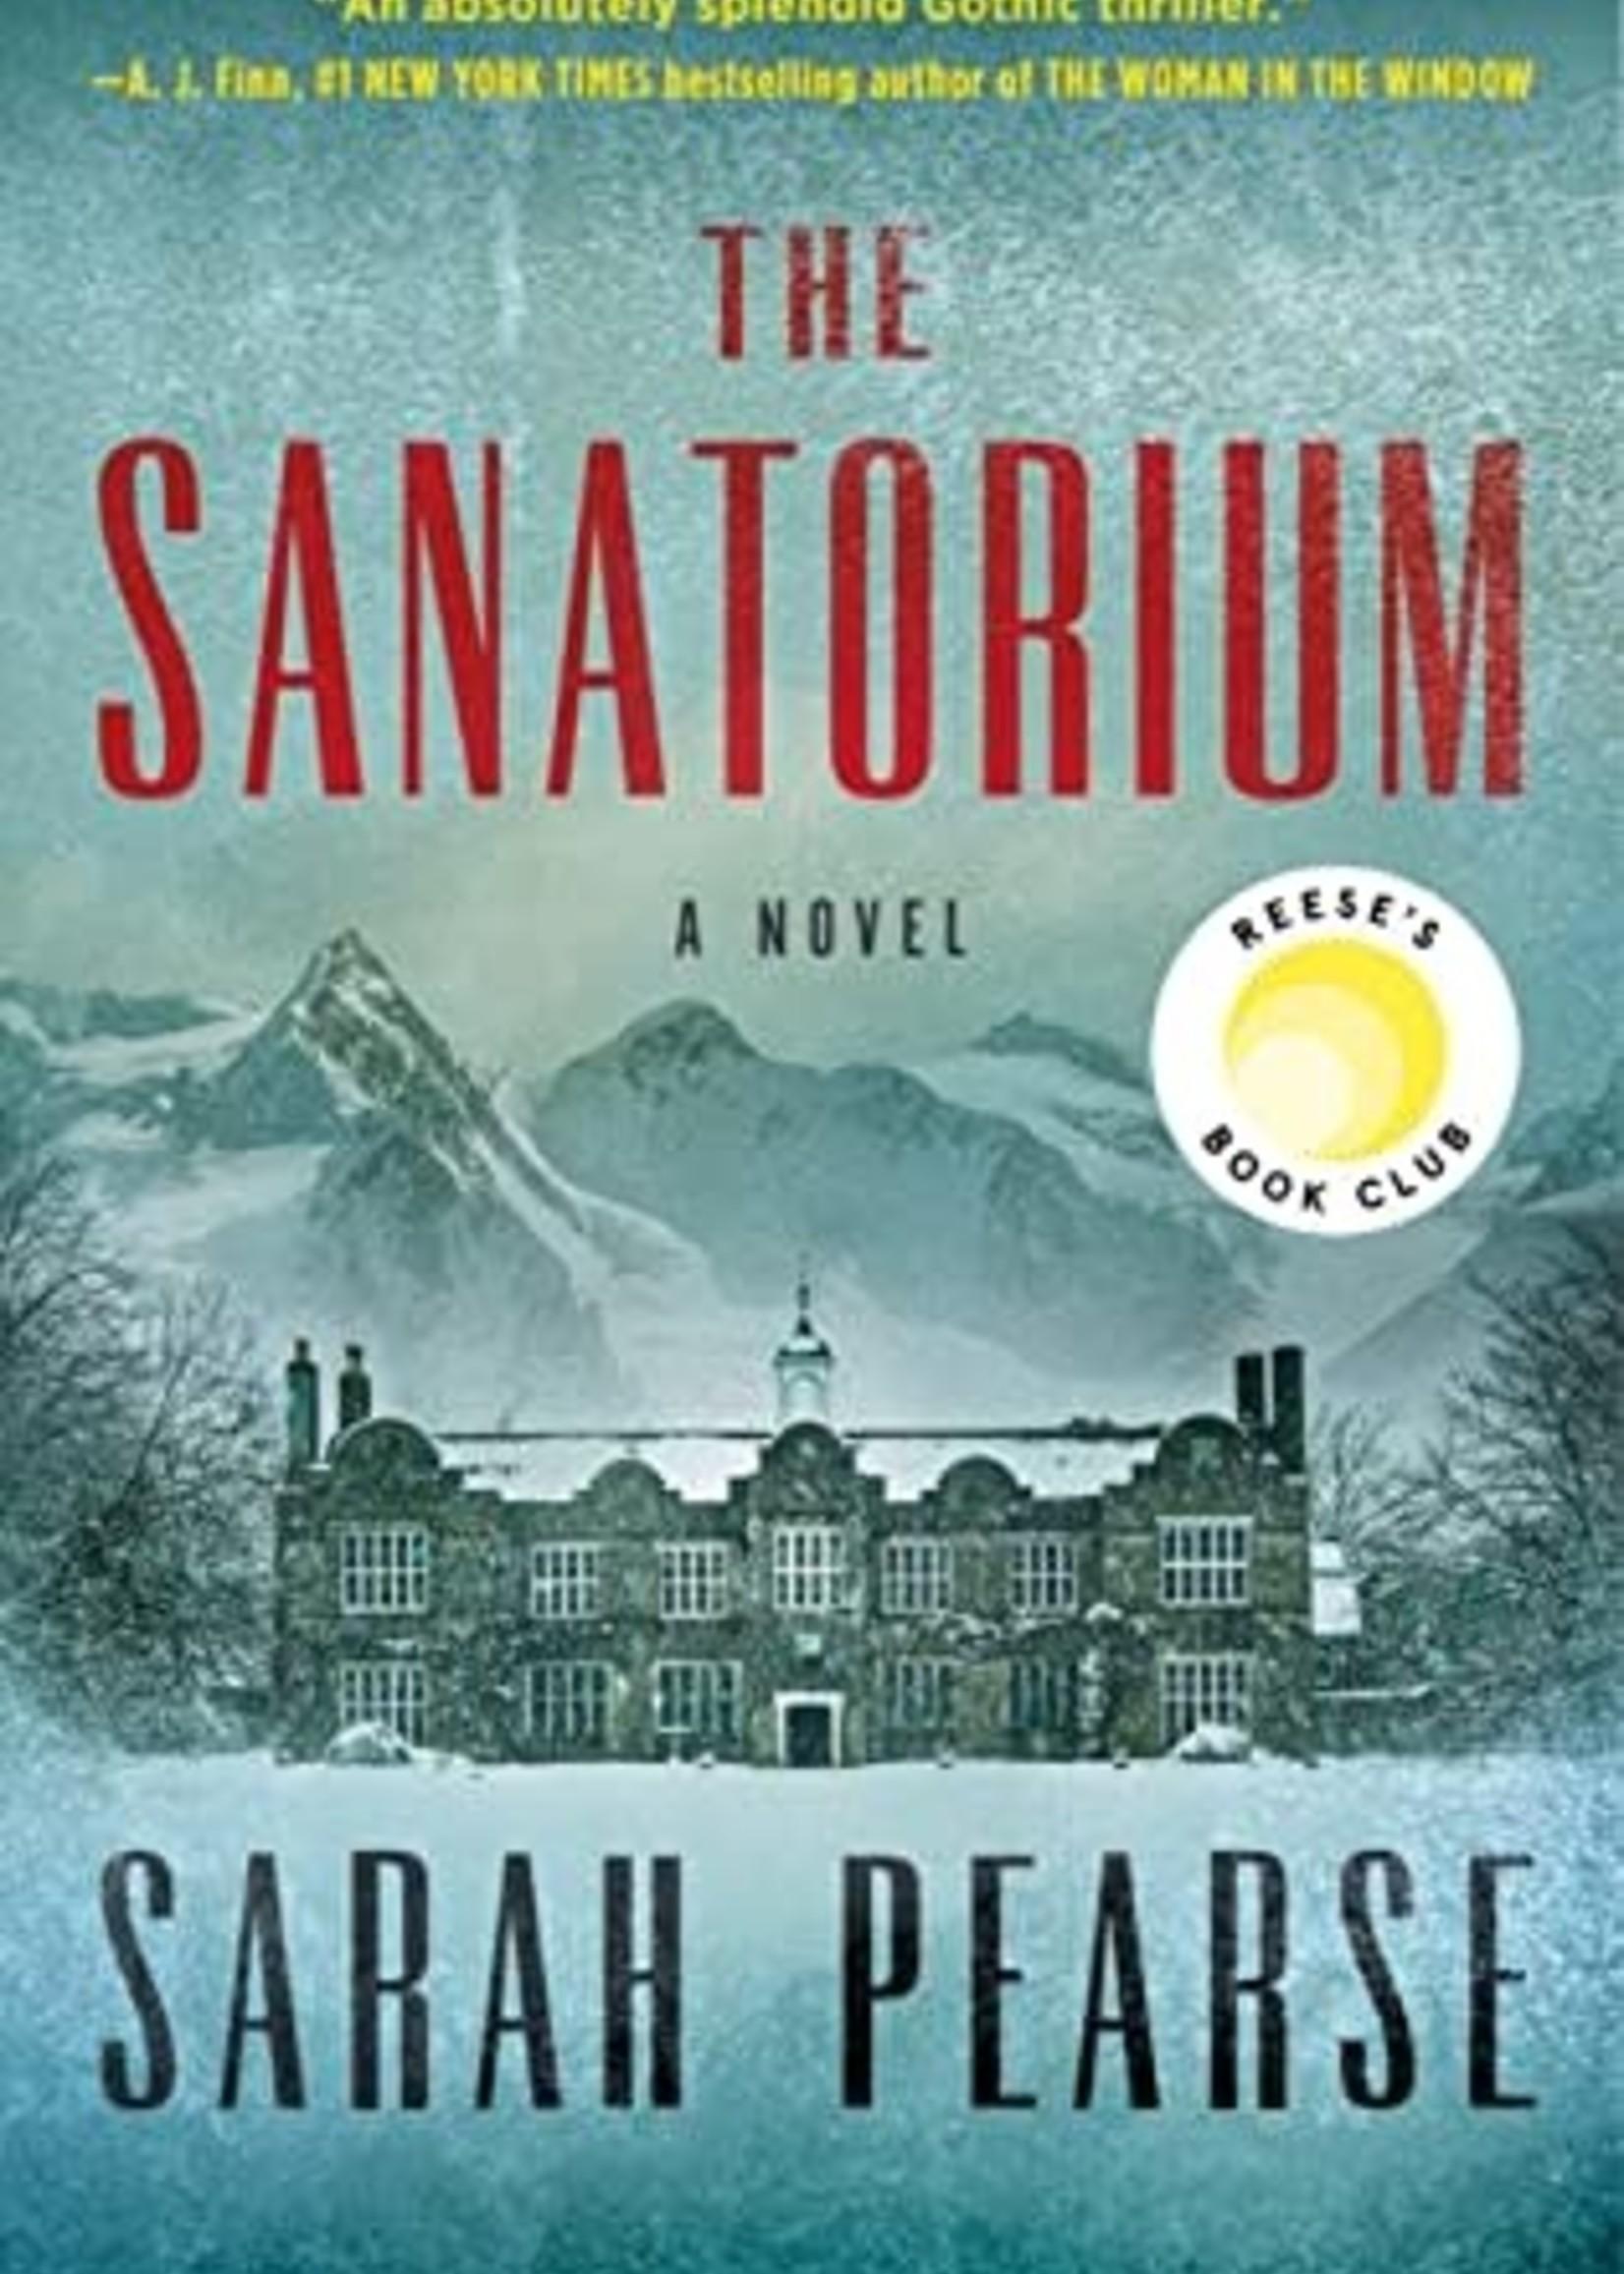 The Sanatorium (Detective Elin Warner #1) by Sarah Pearse